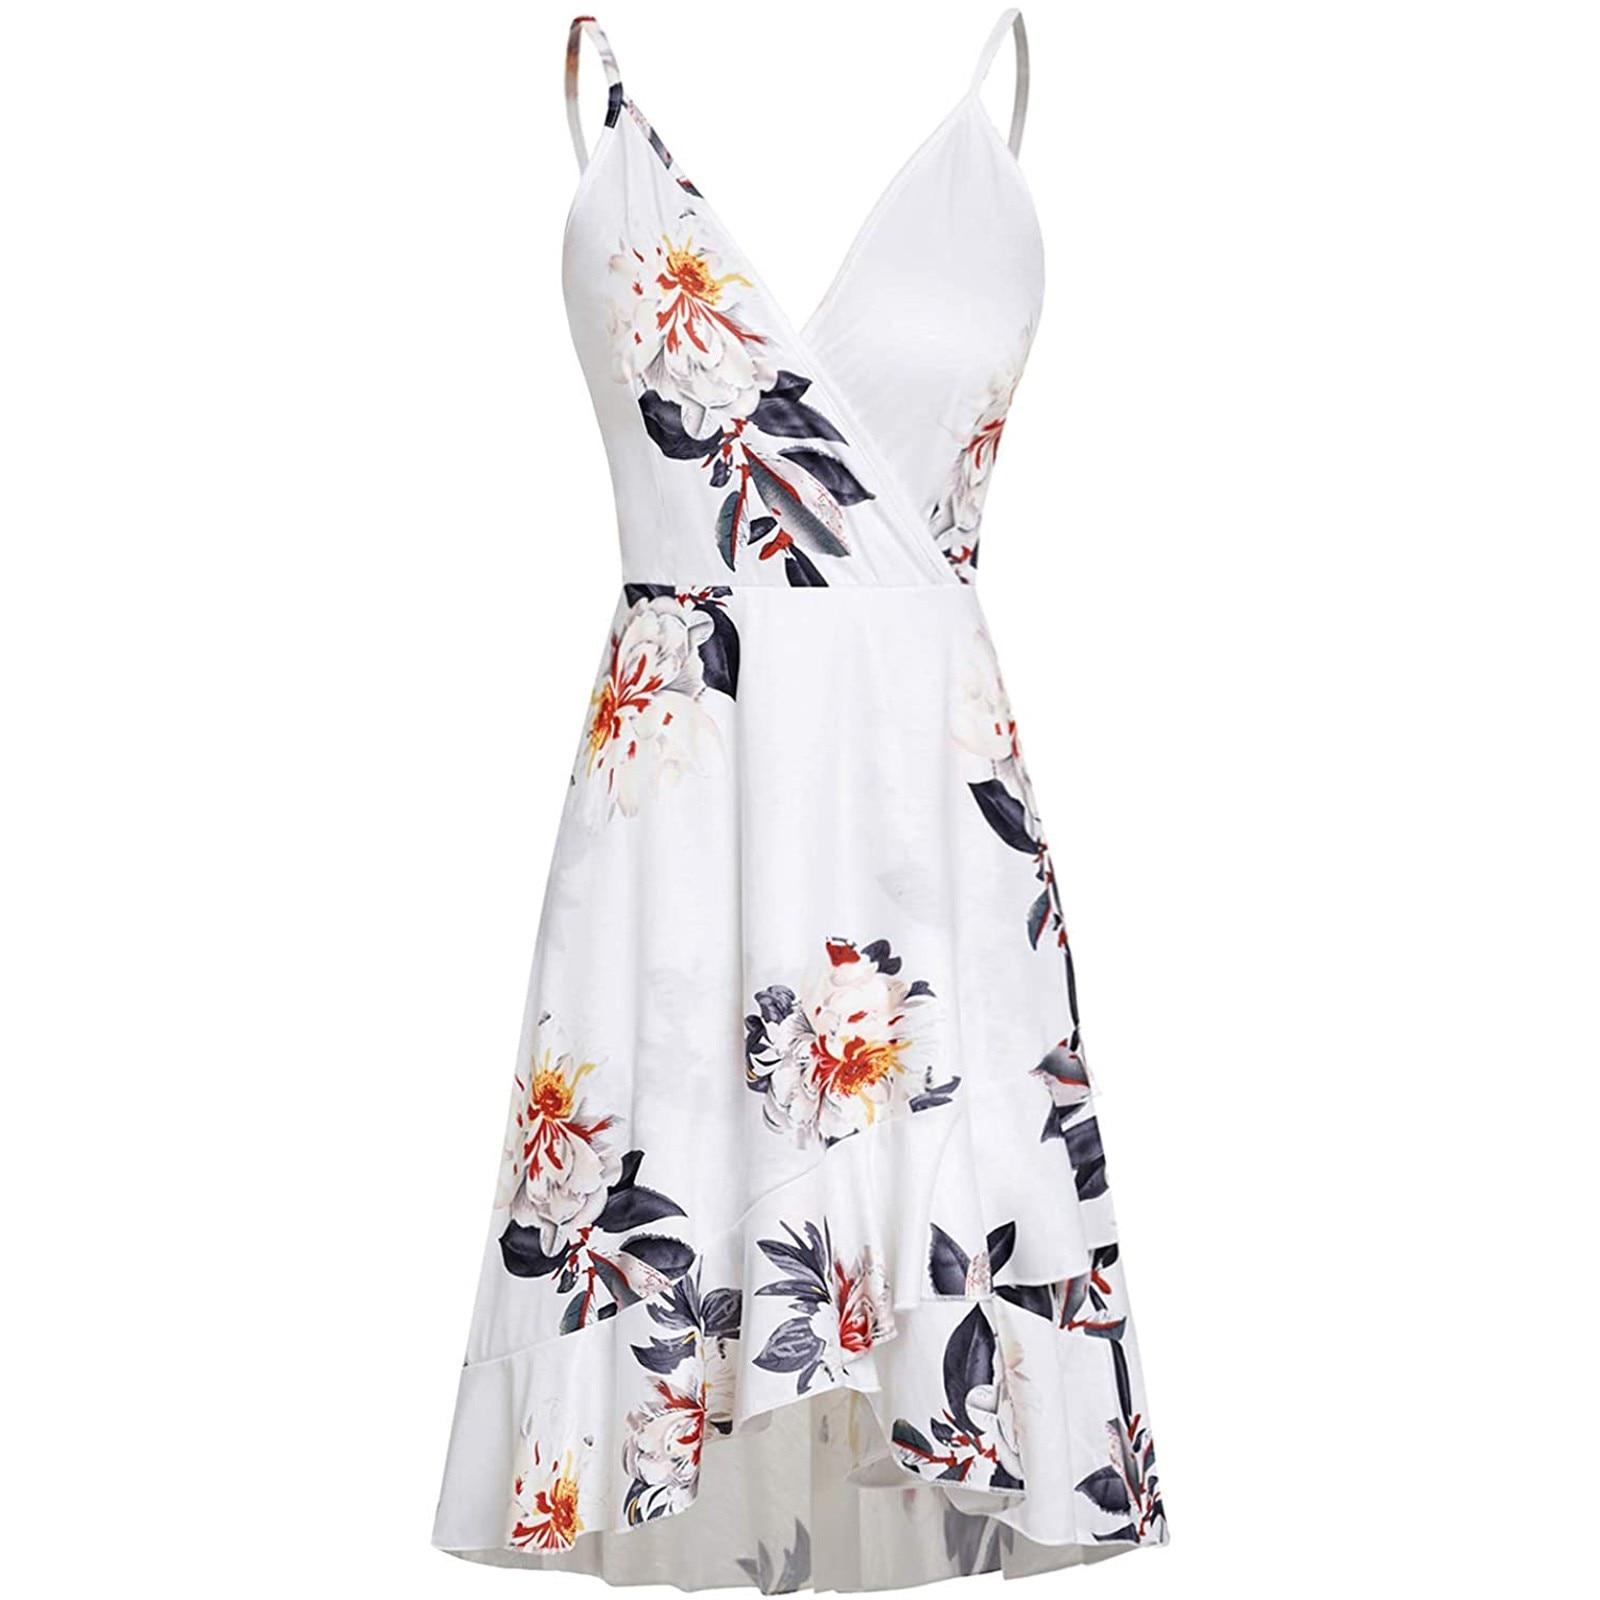 Eytino Women Sexy V Neck Long Sleeve Open Back Printed Mini Short Dresses 5